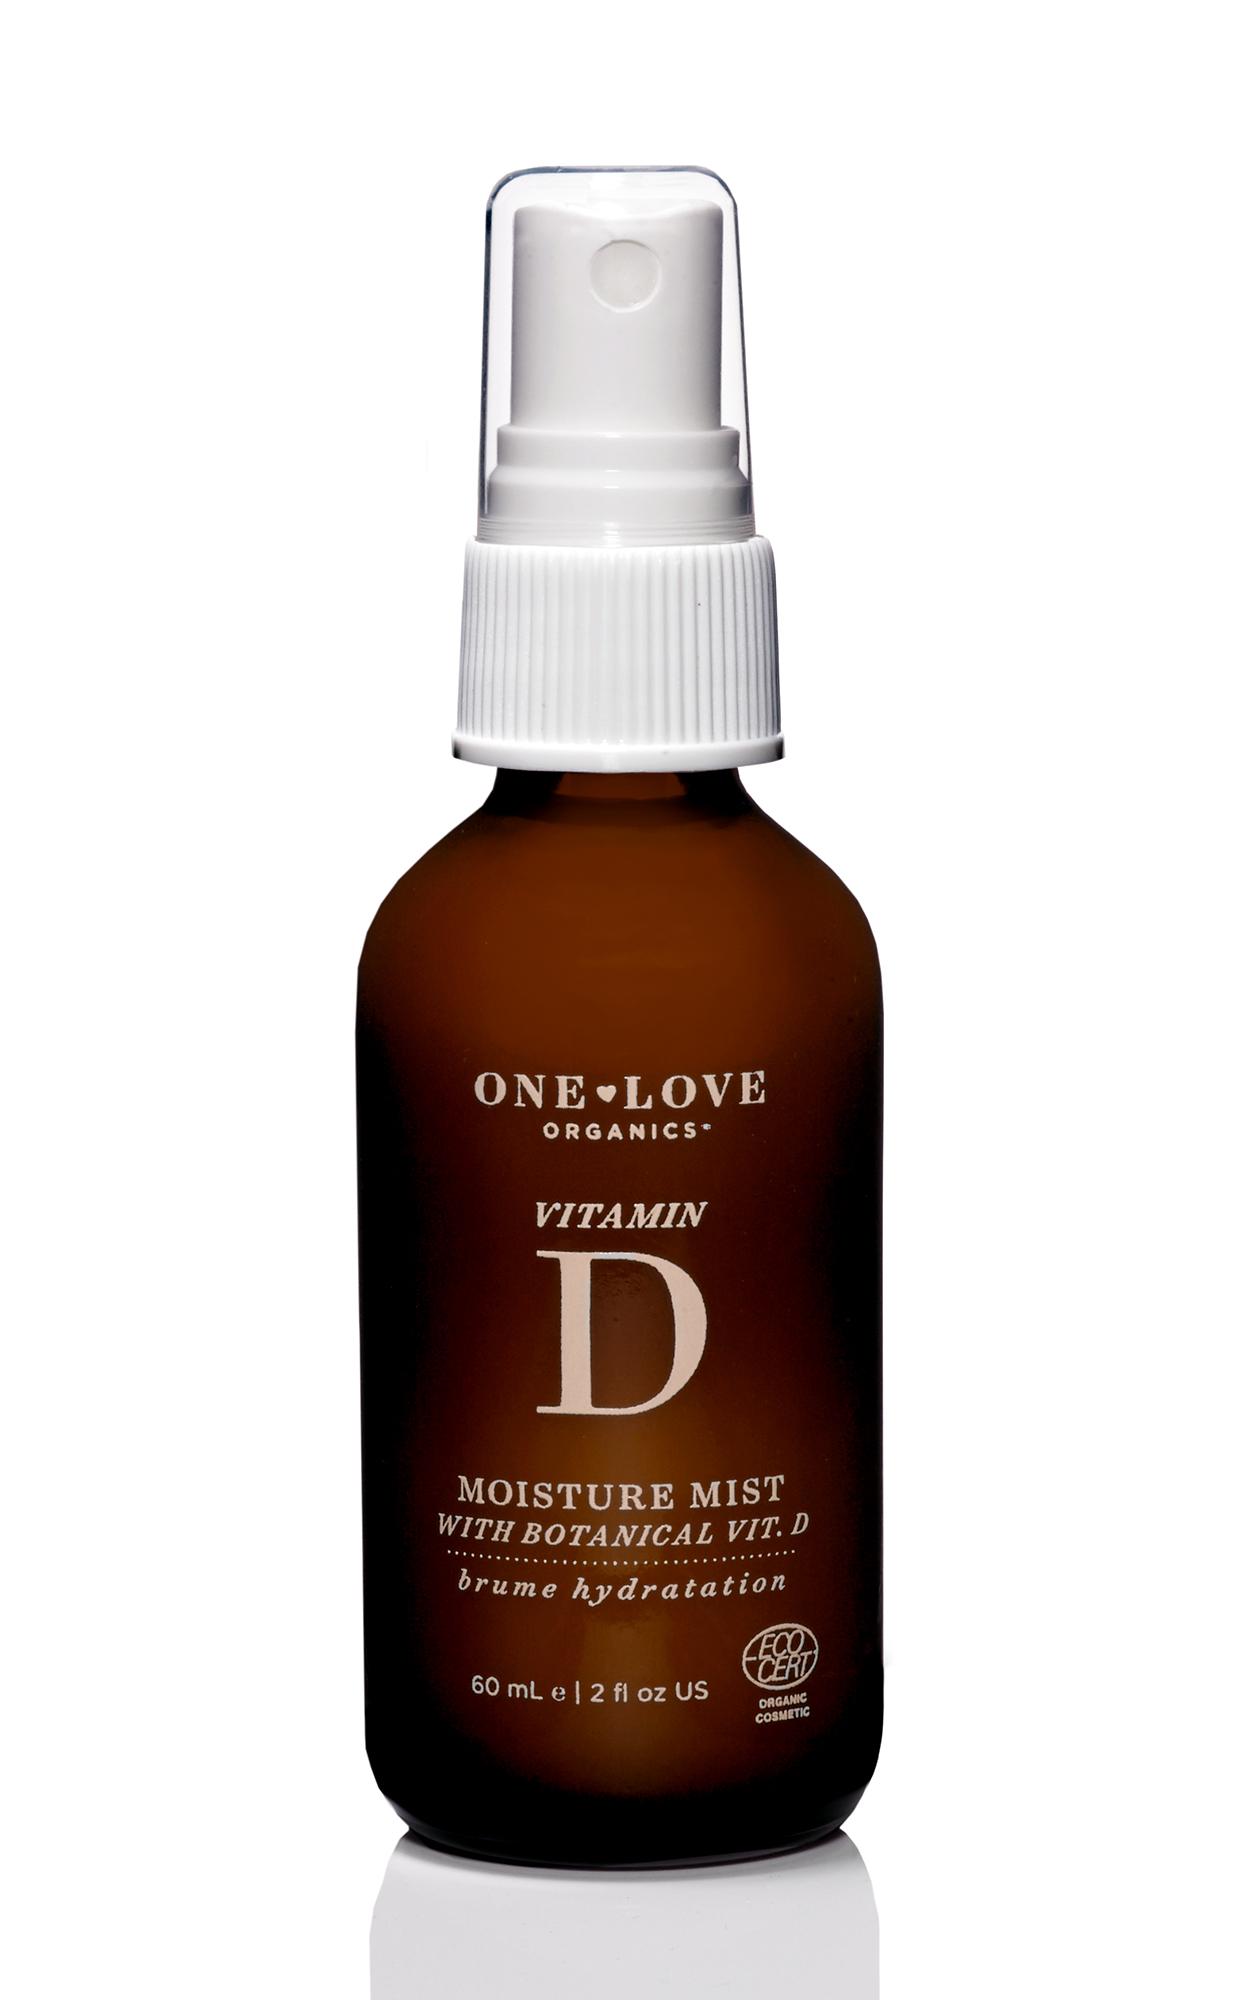 One Love Moisture Mist with Vitamin D